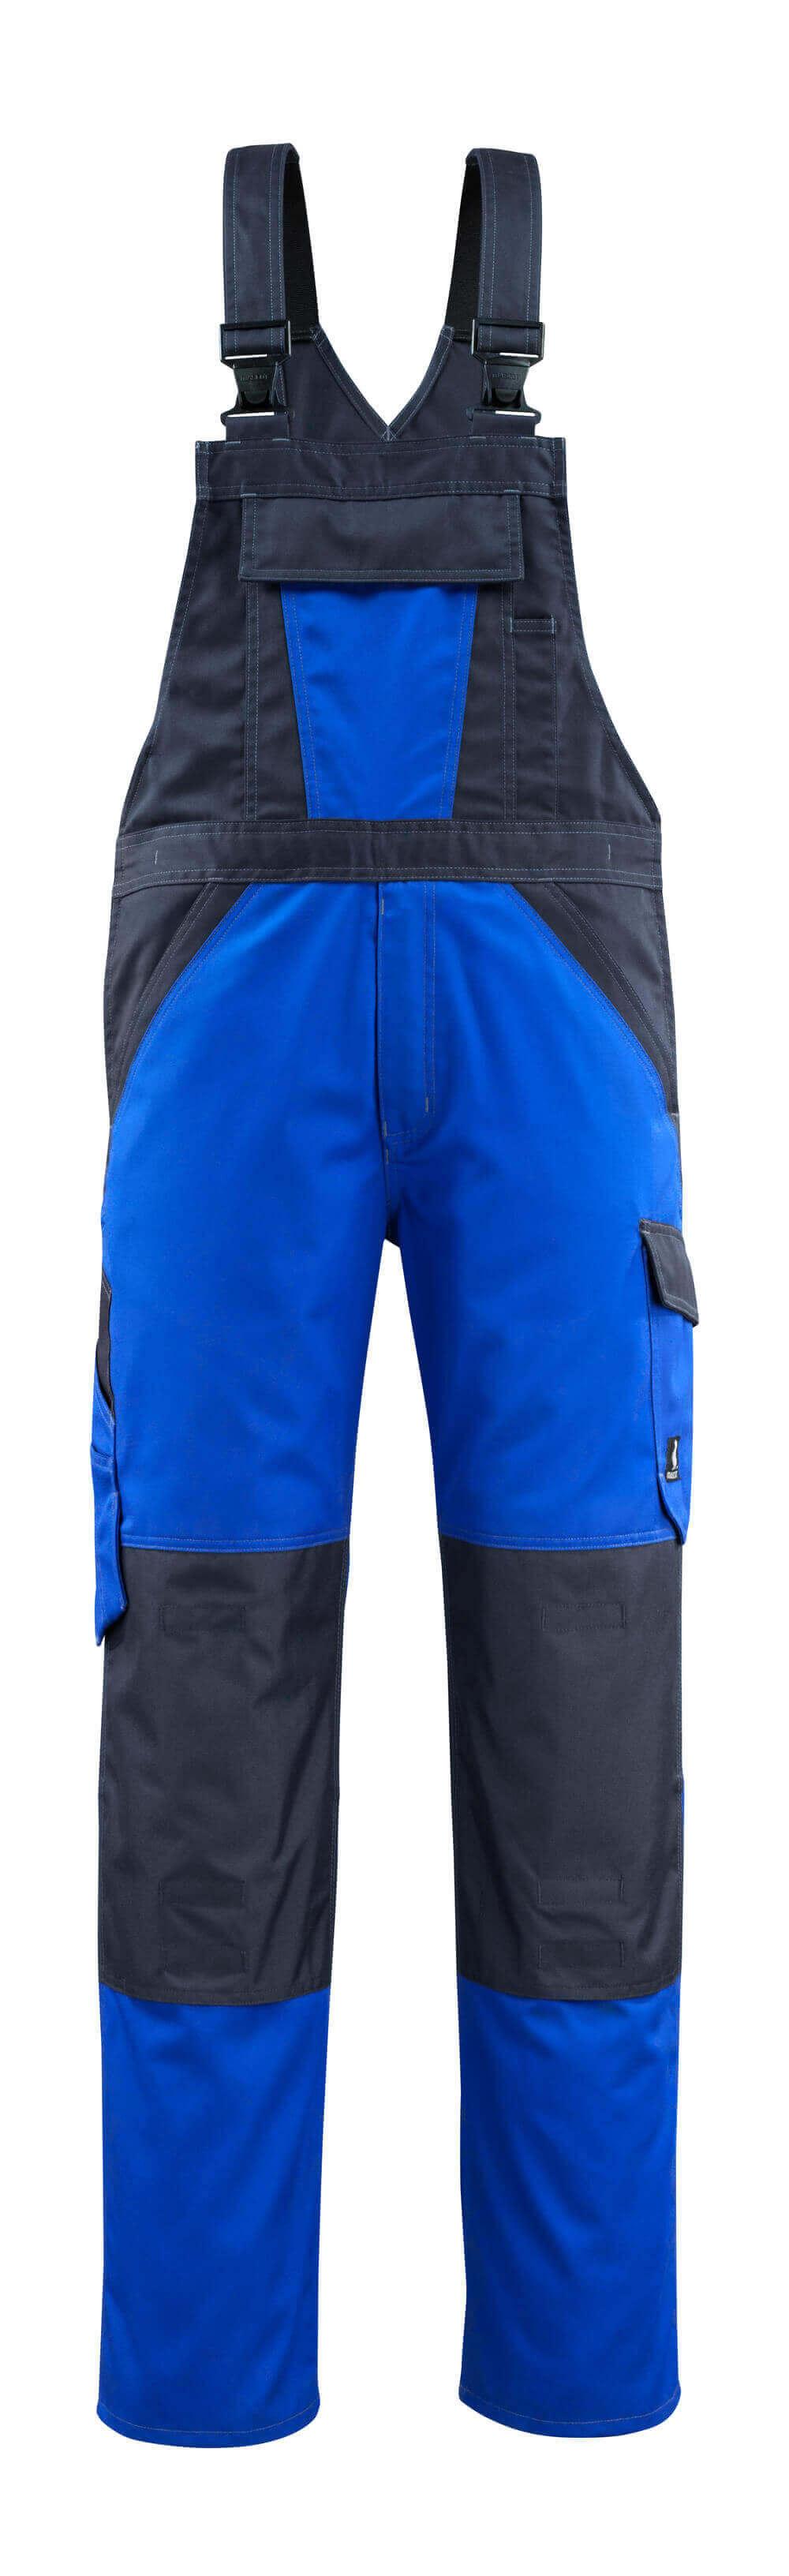 15769-330-11010 Bib & Brace with kneepad pockets - royal/dark navy